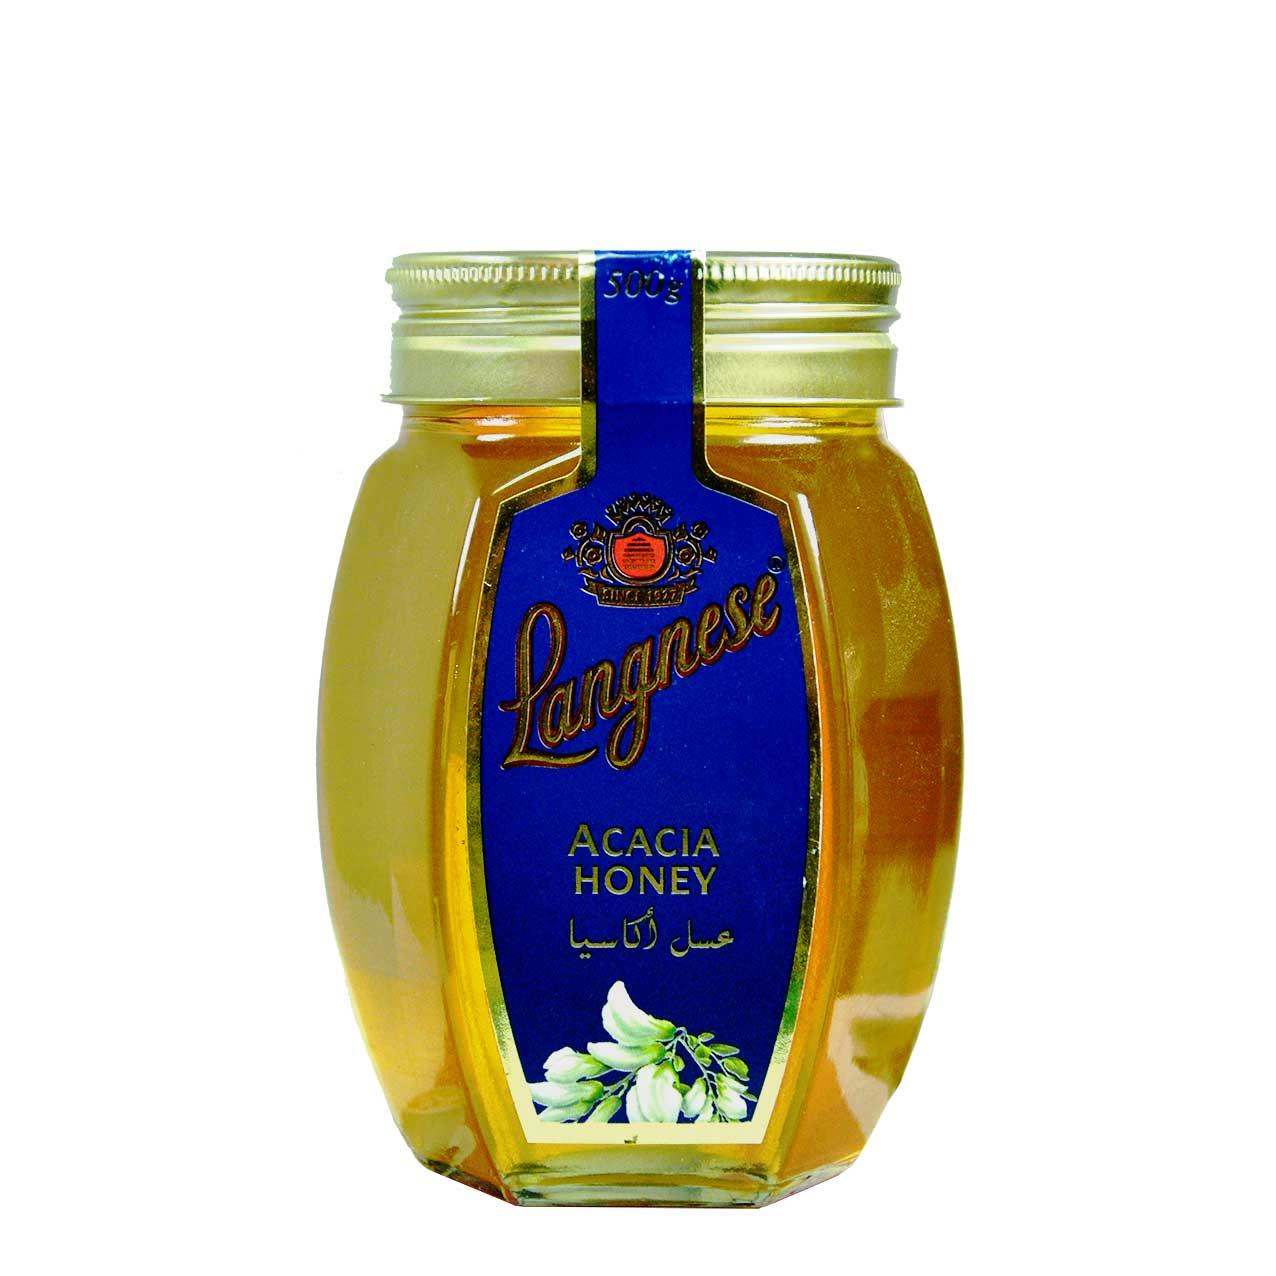 عسل اقاقیا لنگنس – langnese